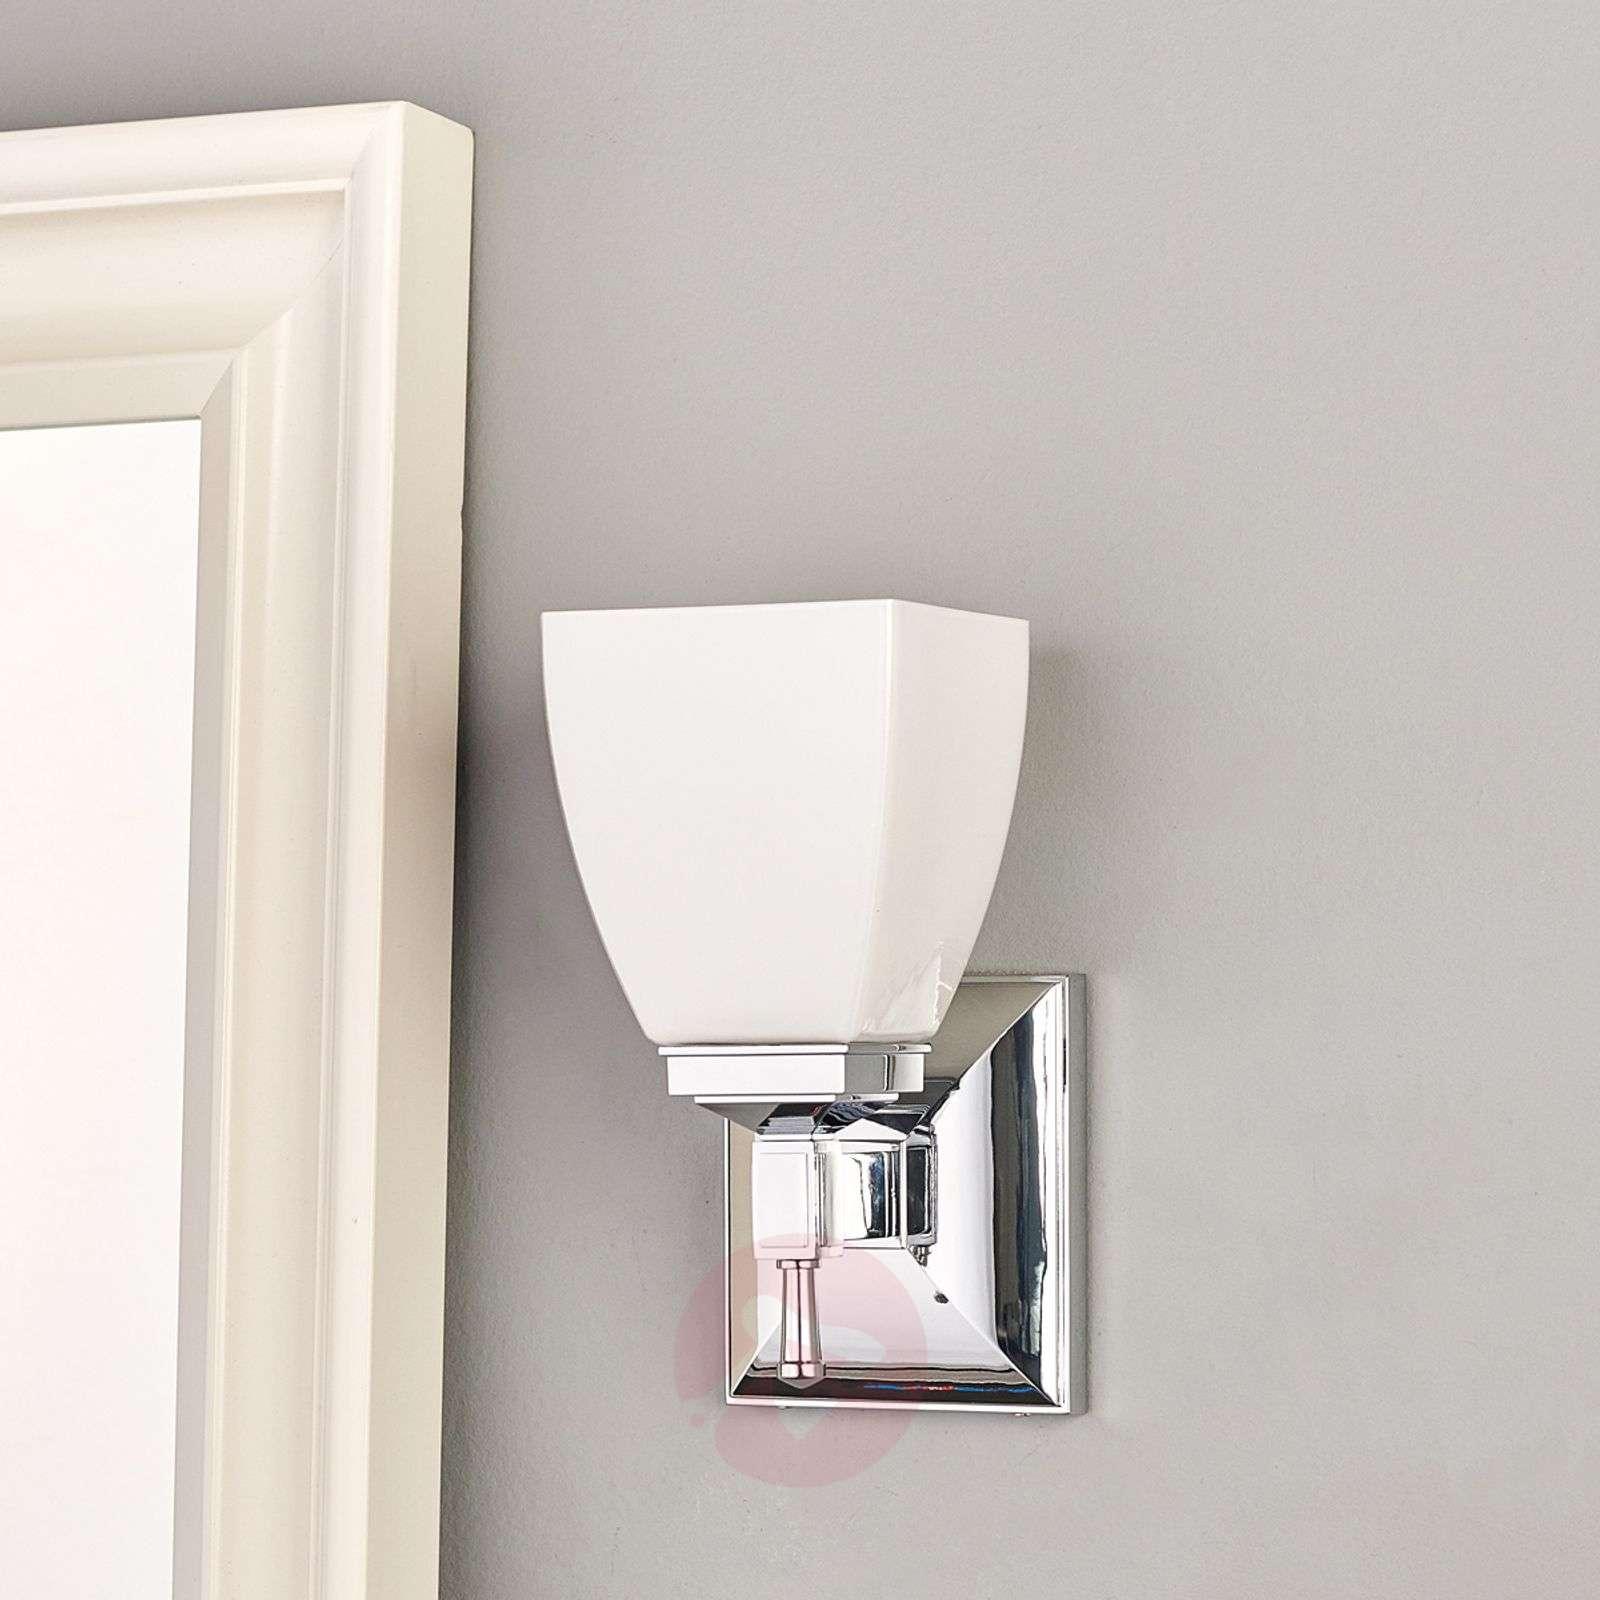 Shirebrook Mirror Light Small-3048154-02